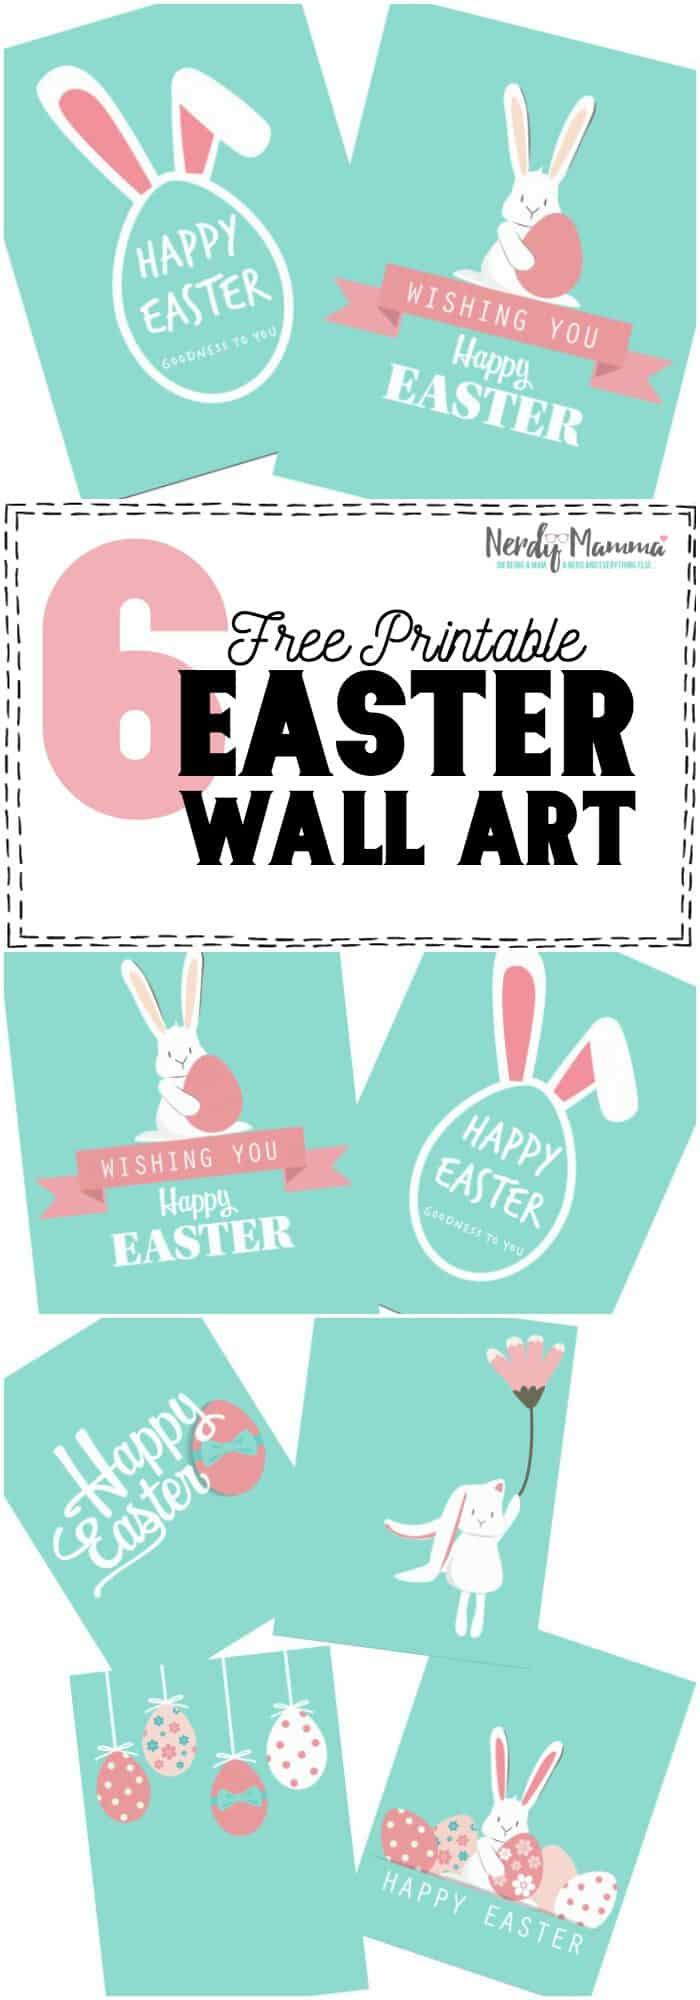 free printable easter wall art poster